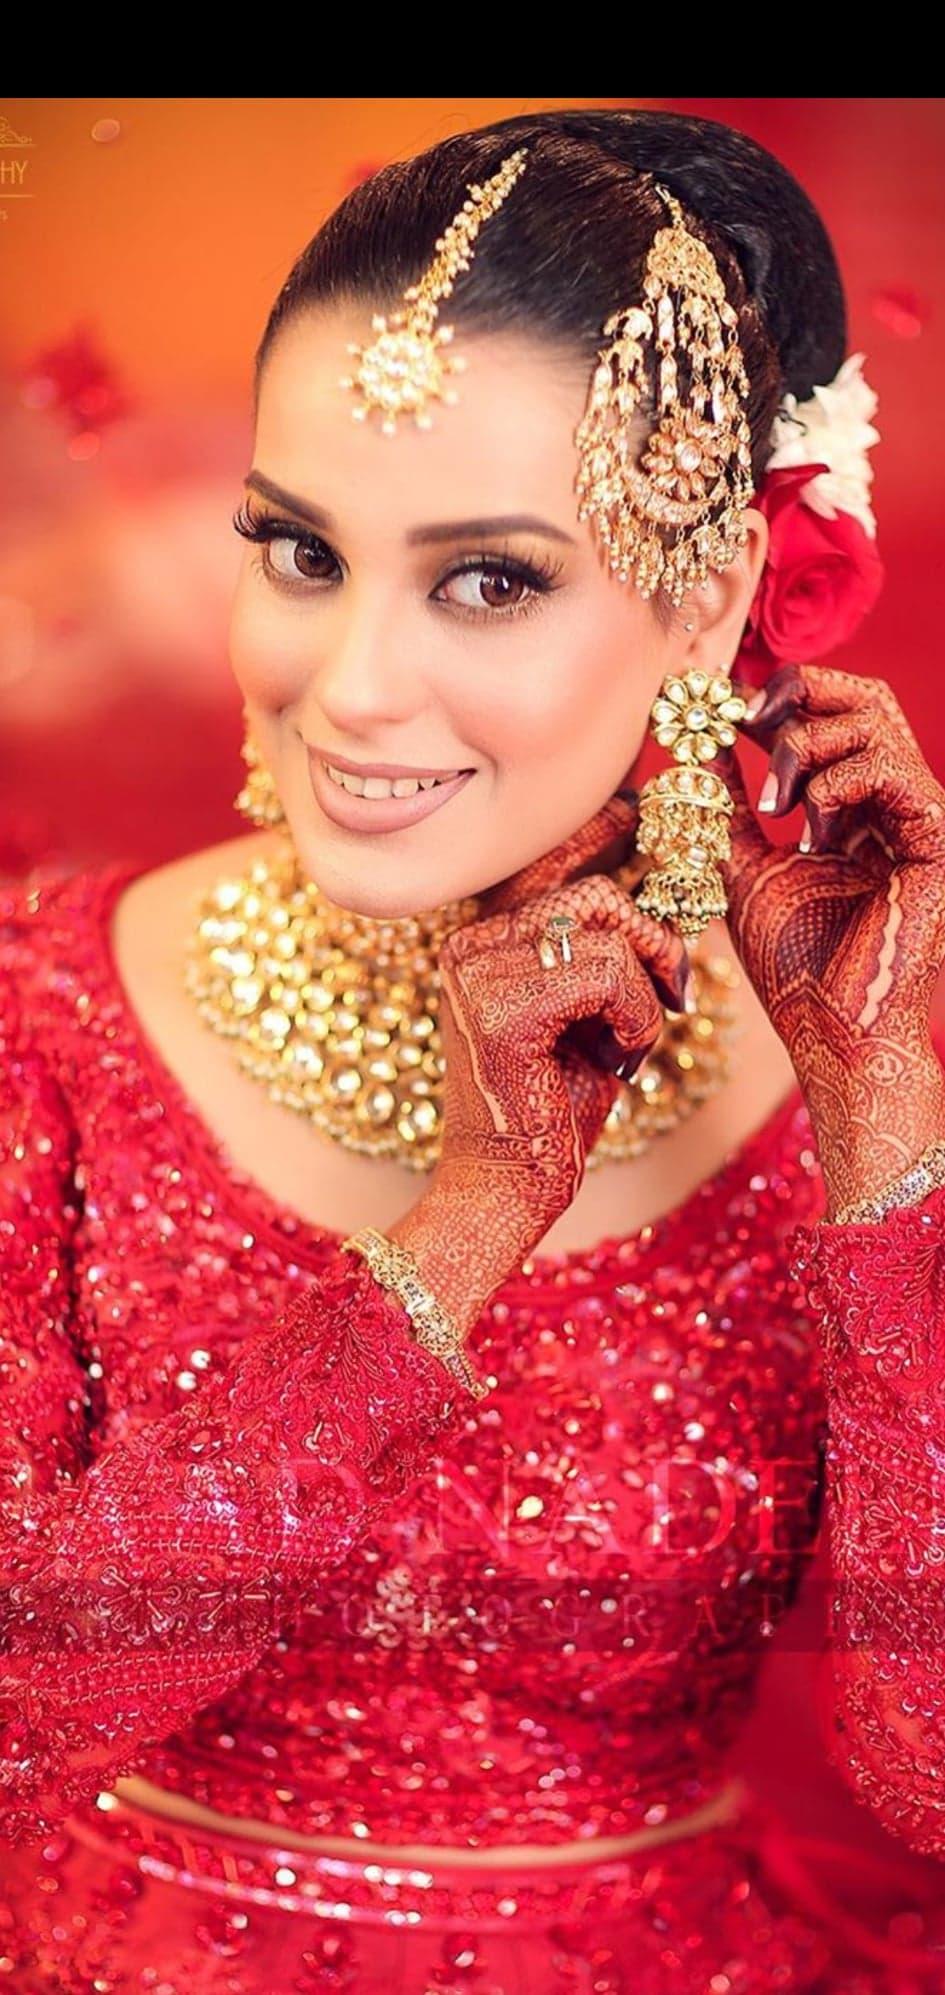 Iqra Aziz Beautiful Wedding Dress and Makeup Look